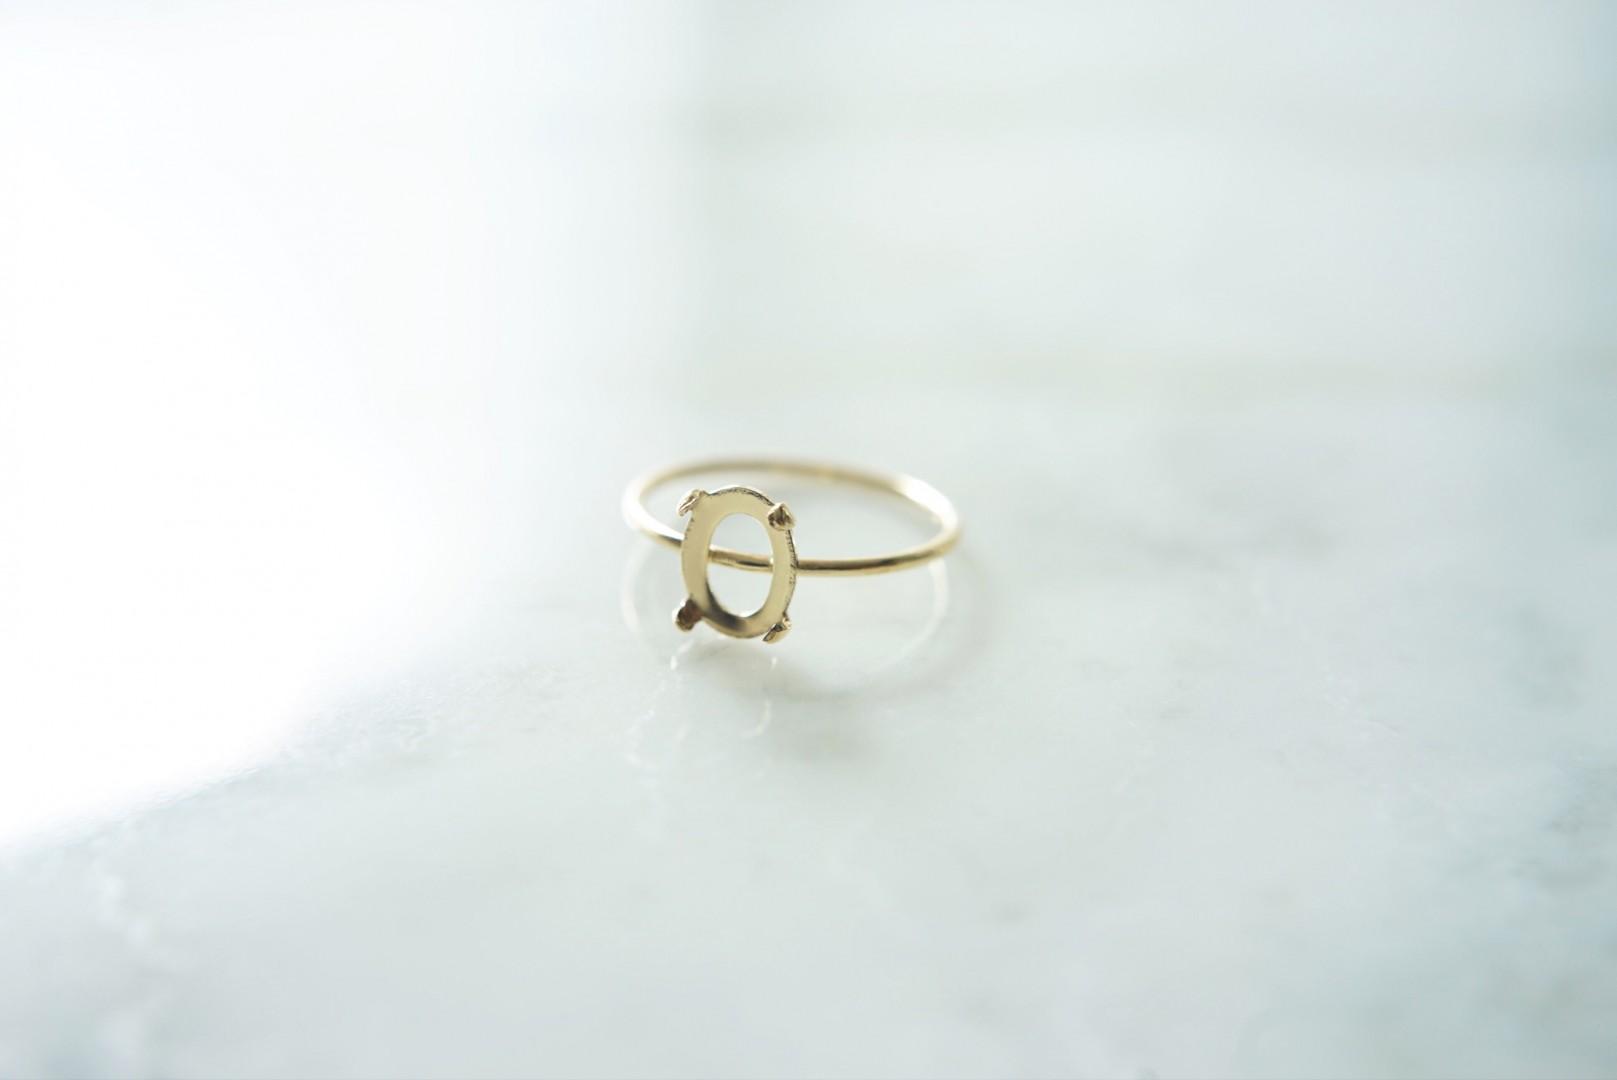 14kgf指輪石枠-カボション4本爪-オーバル8x6mm